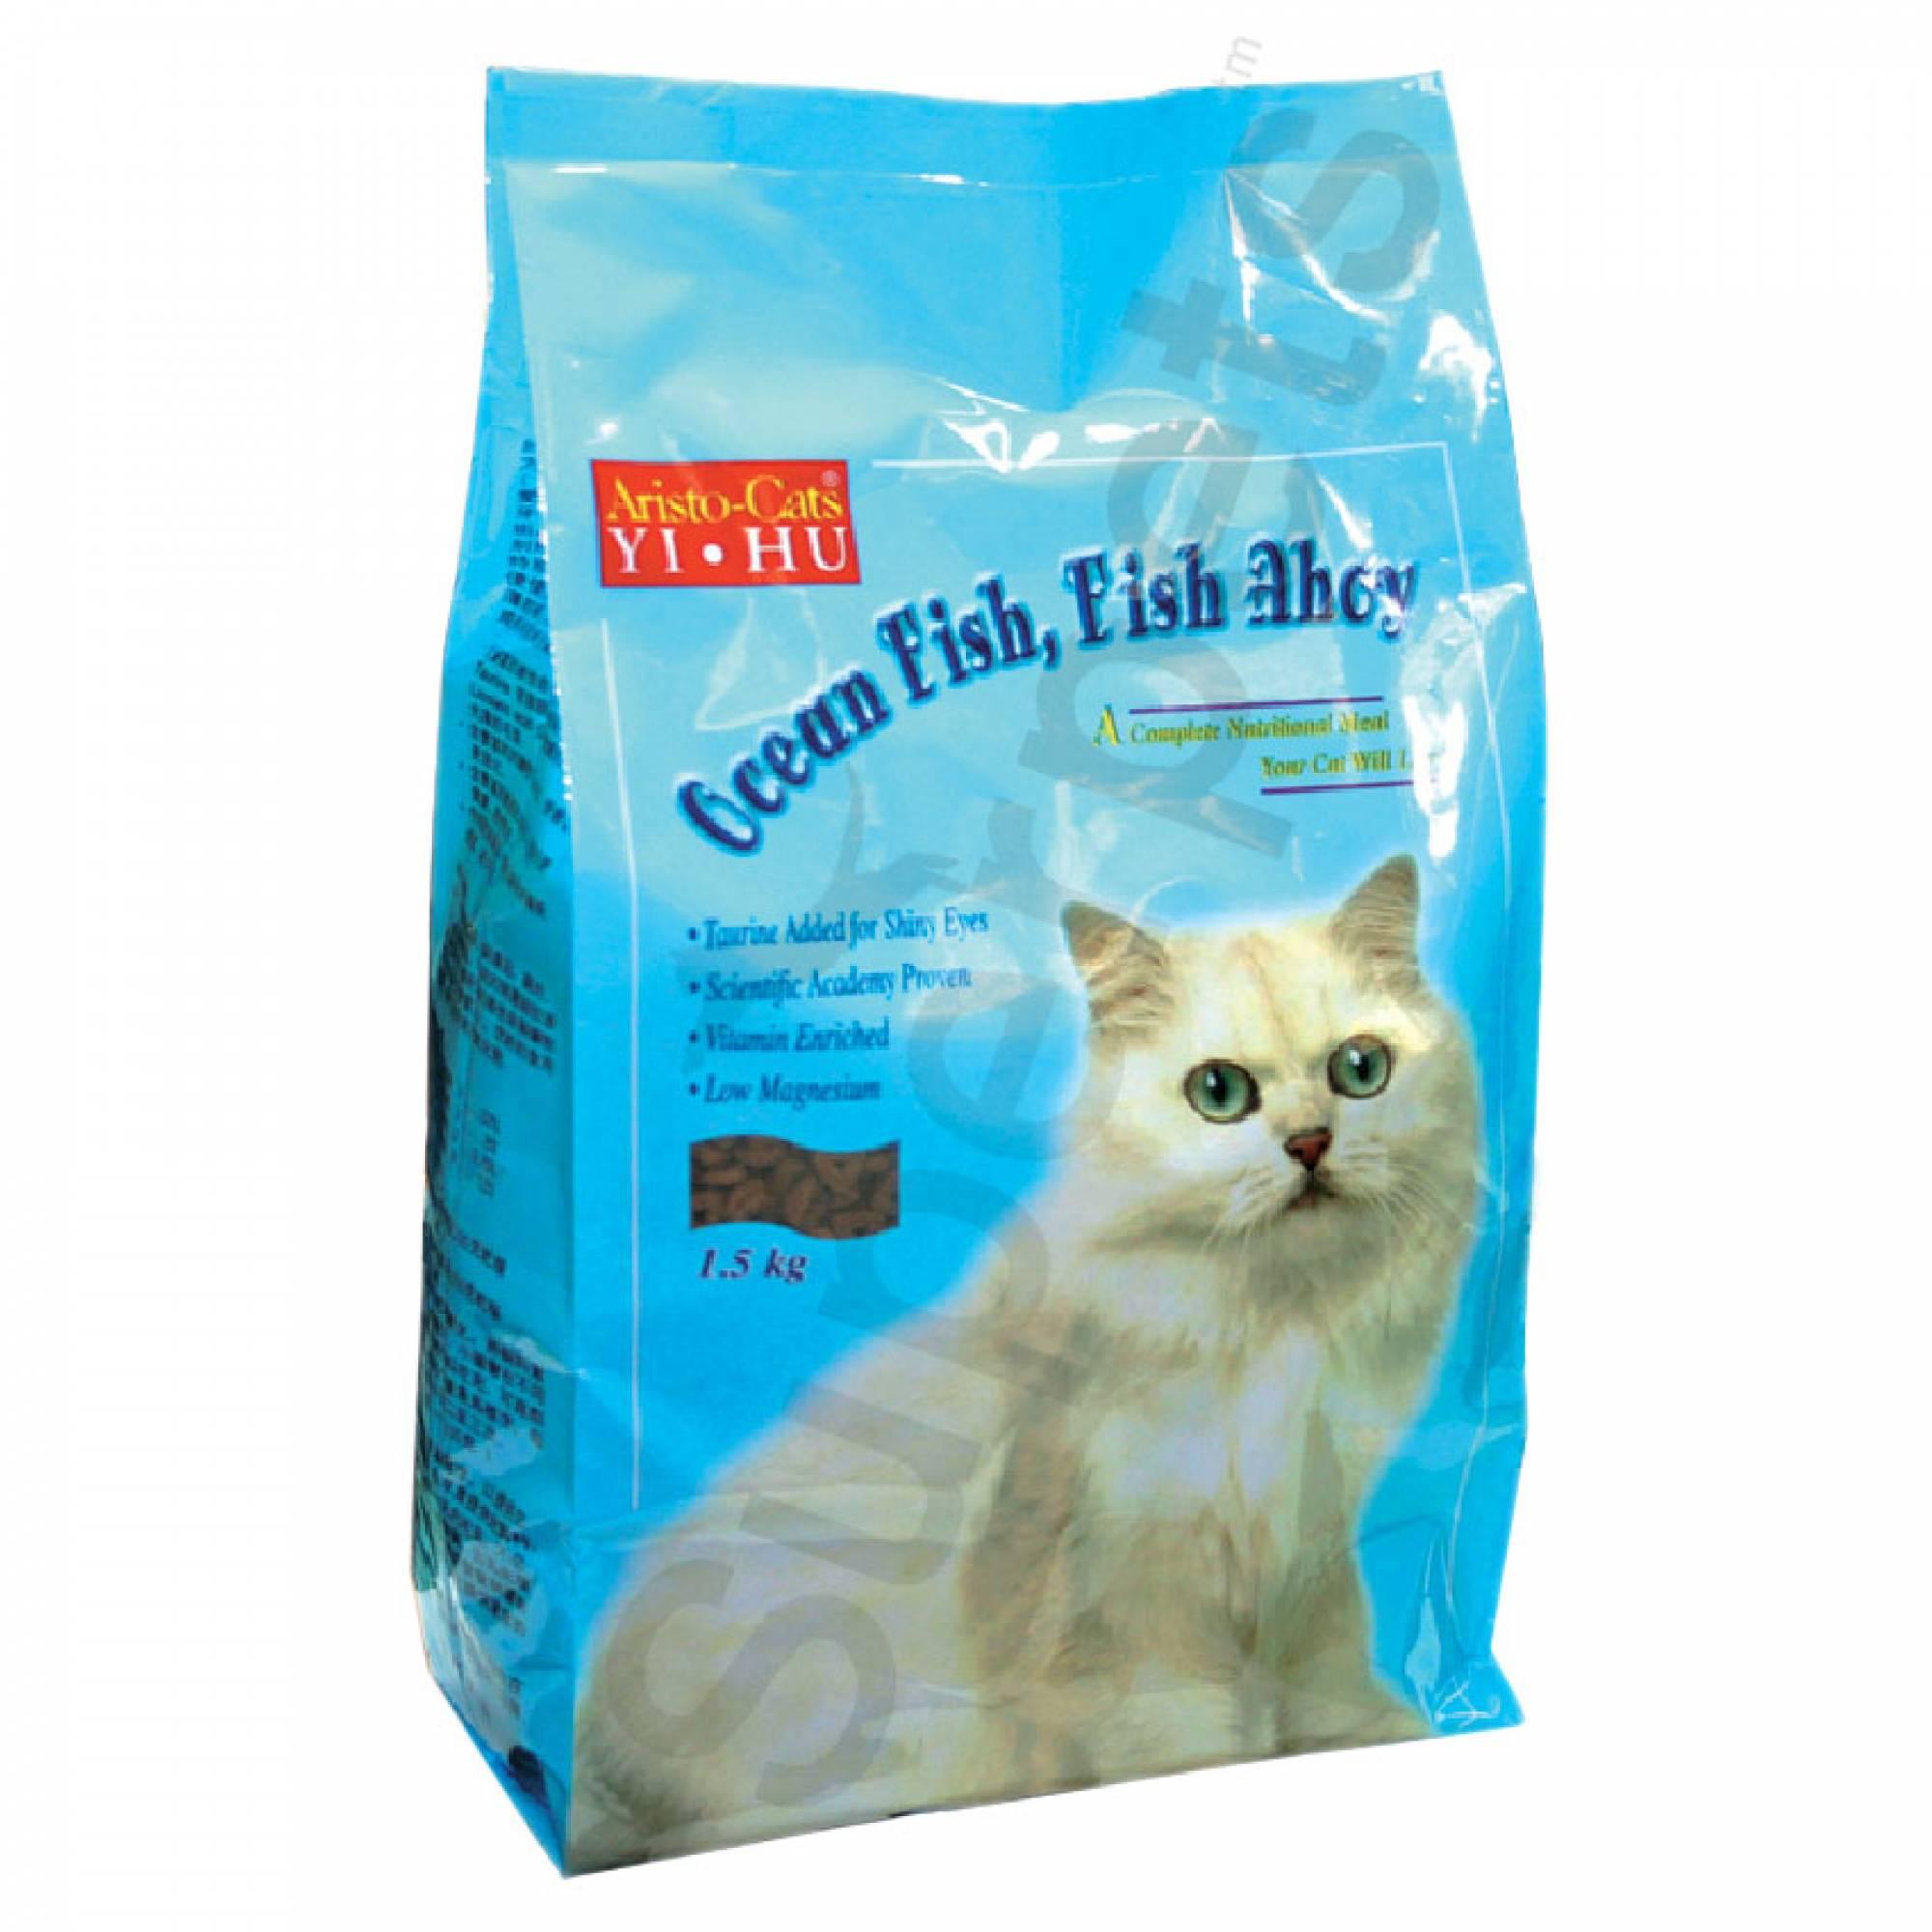 Aristo-Cats - Dry Food - Ocean Fish, Fish Ahoy 1.5kg